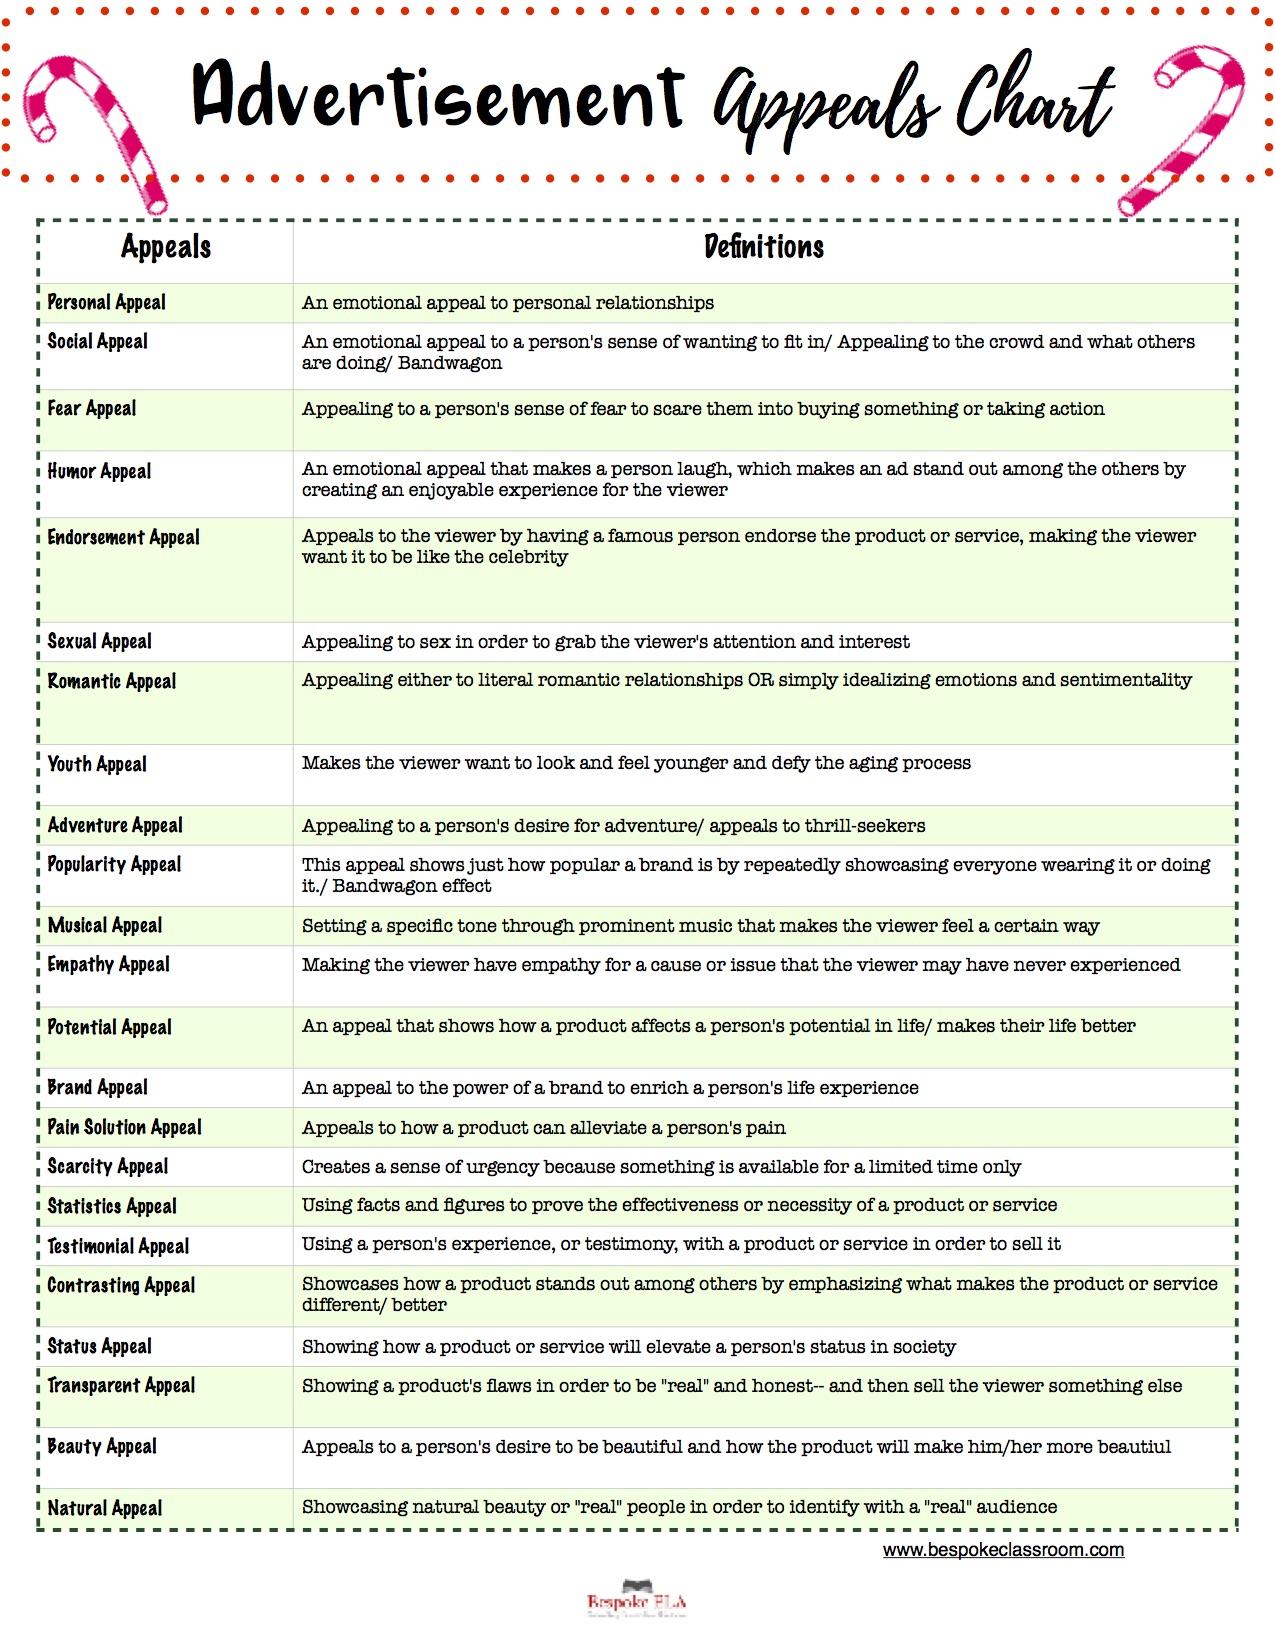 Christmas Ad Analysis Guide by Bespoke ELA 1.jpg